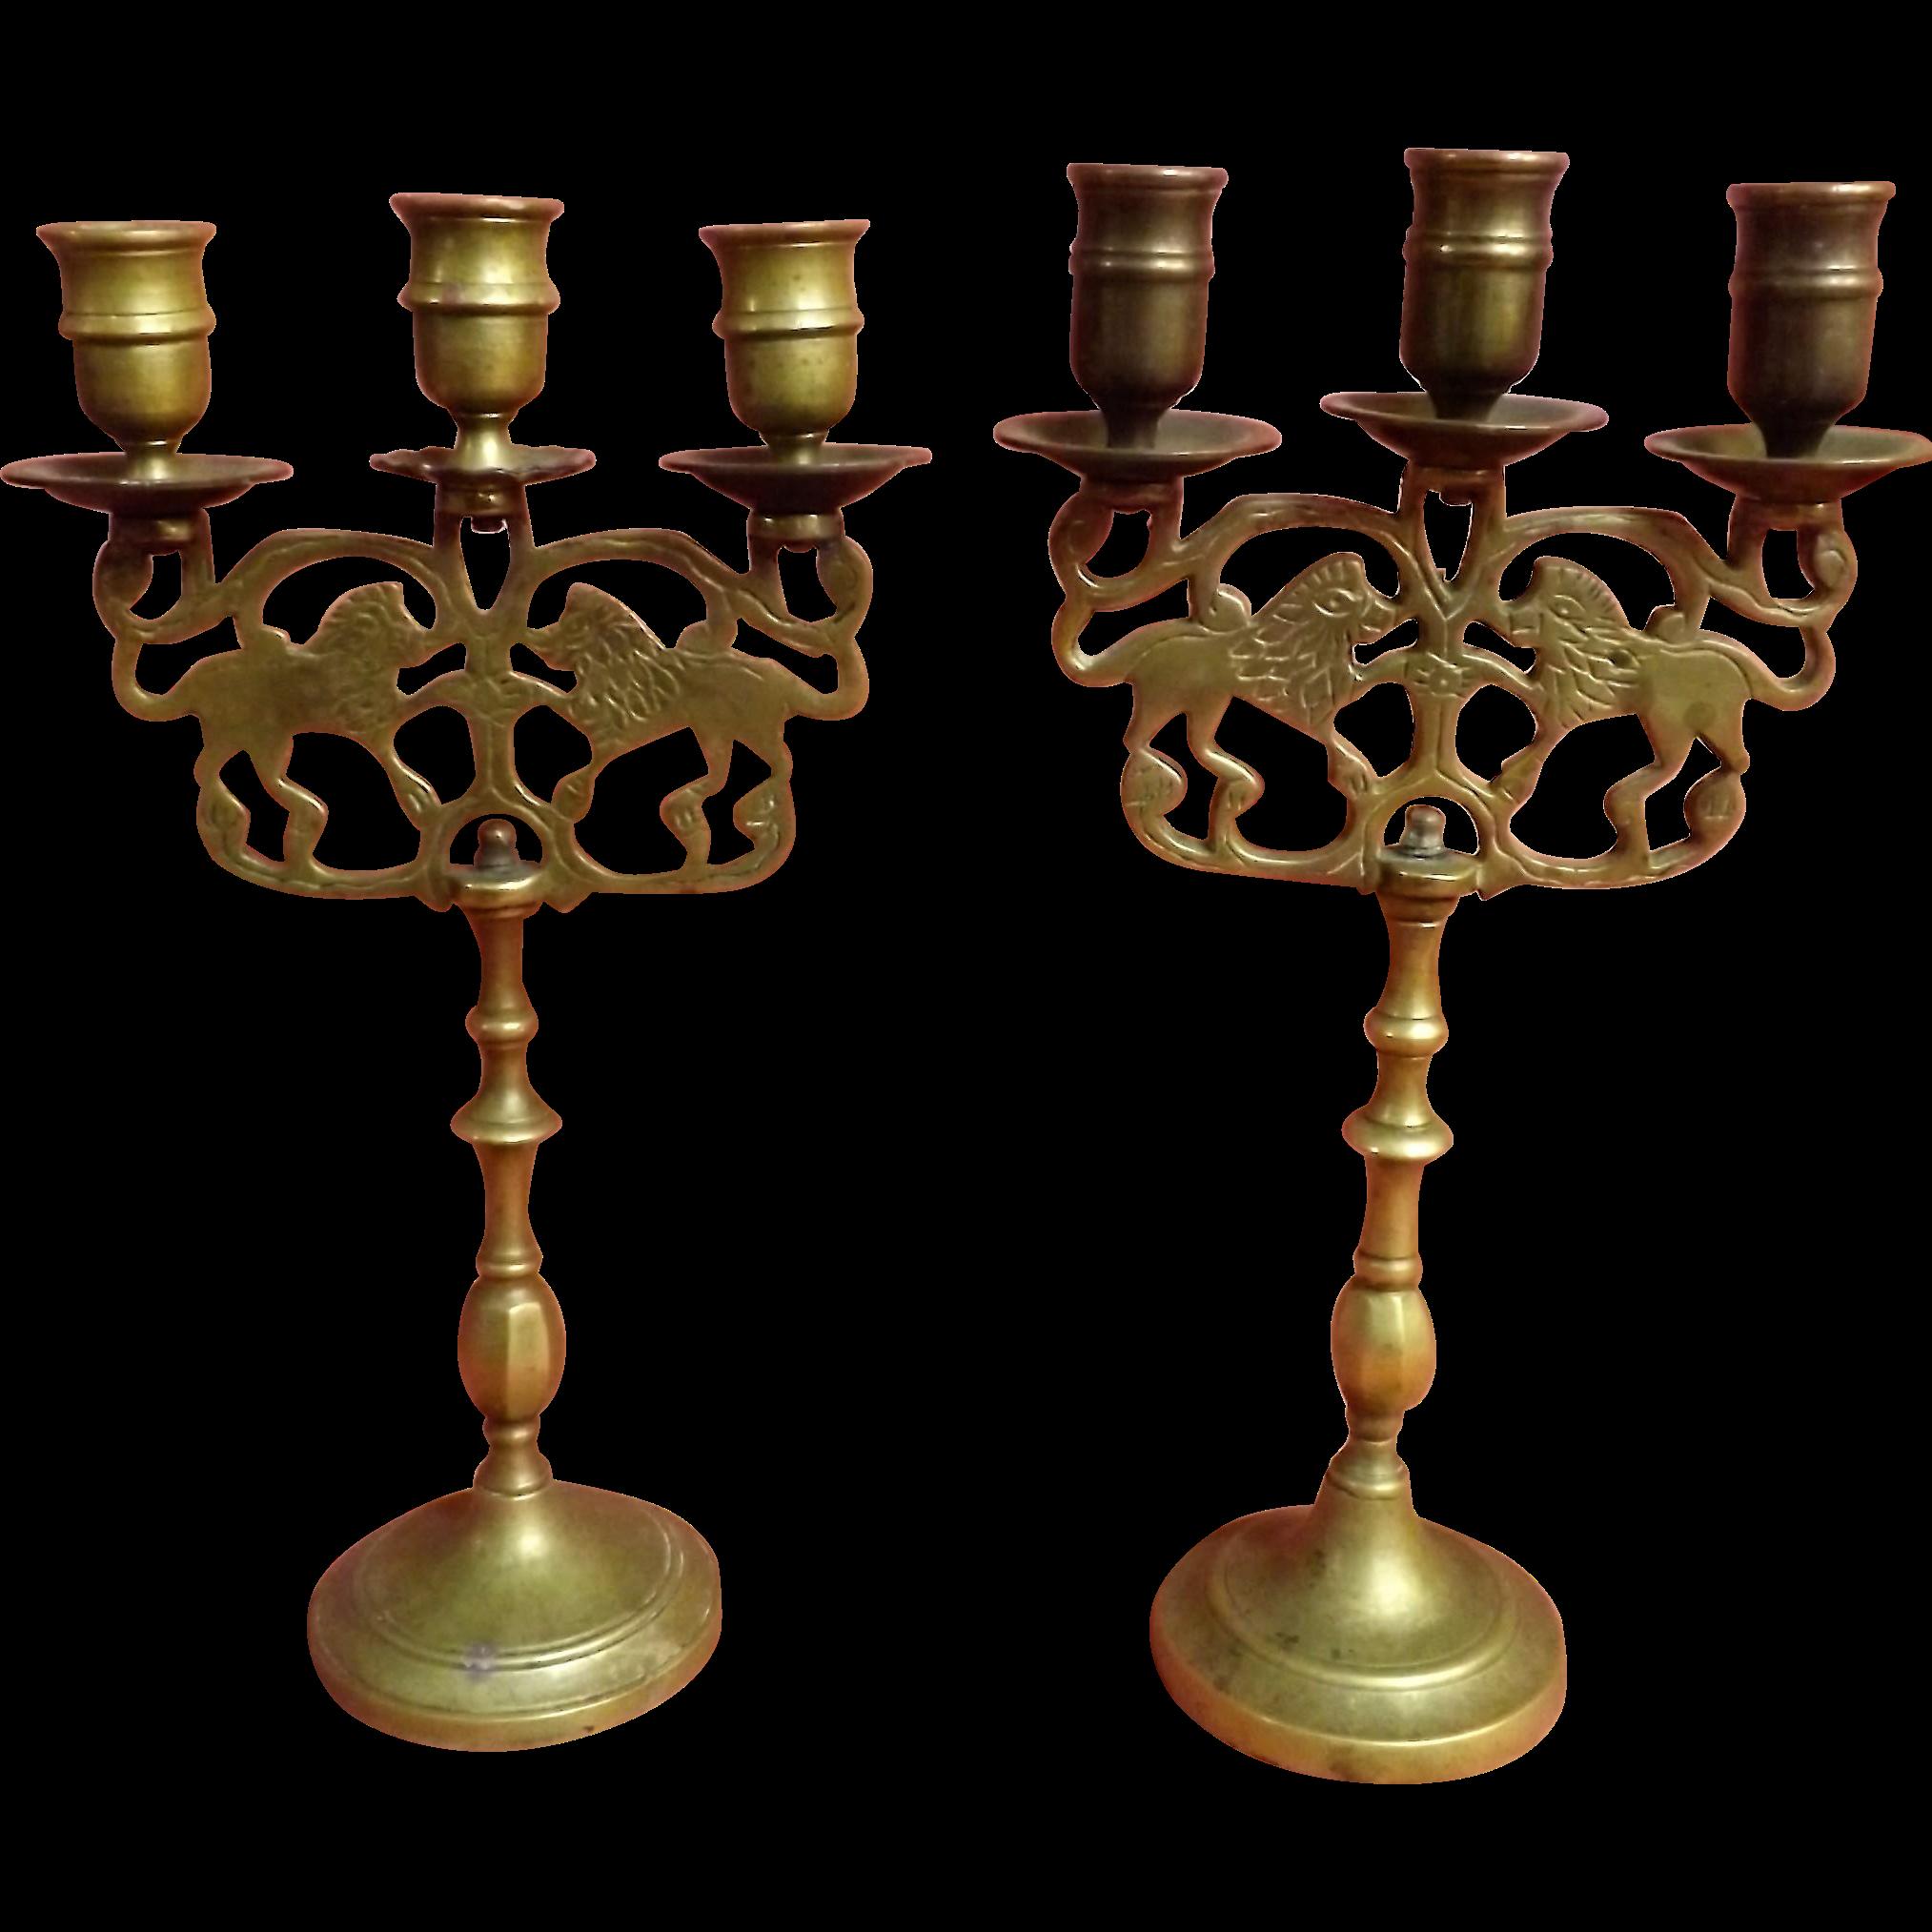 A Pair of Russian 19th Century Jewish Shabbat Candle Sticks